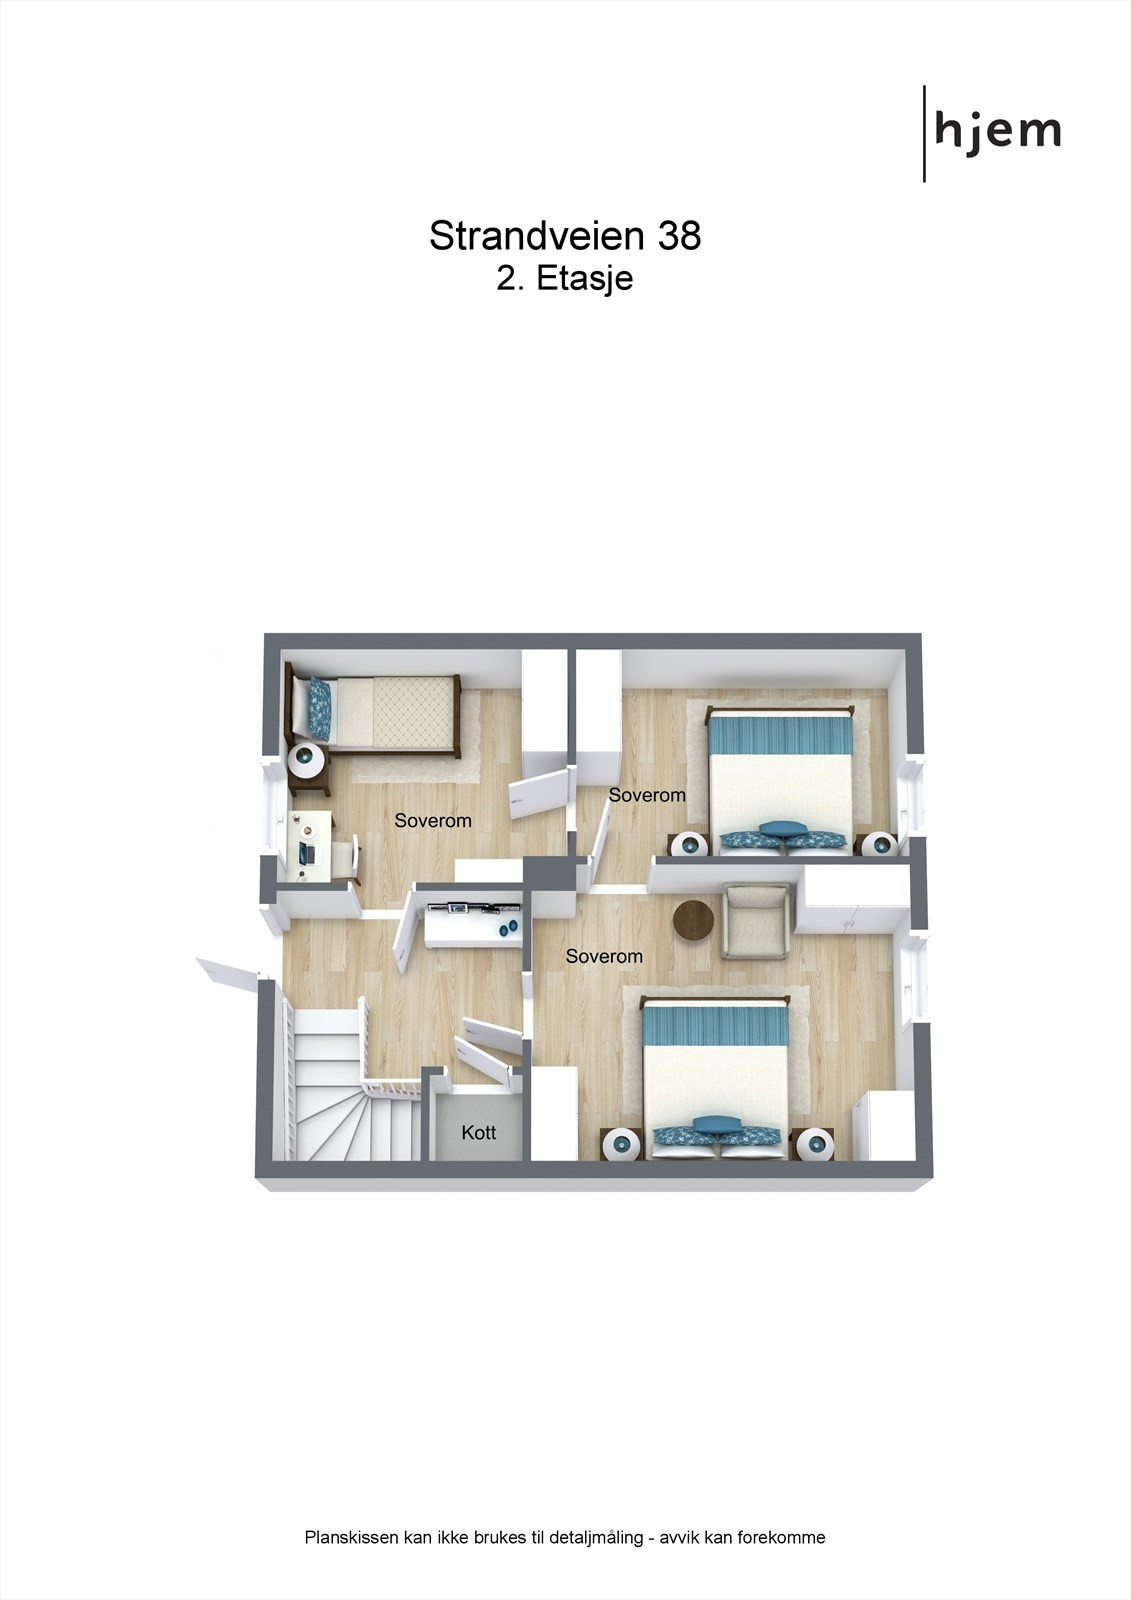 3D planillustrasjon 2. etasje.